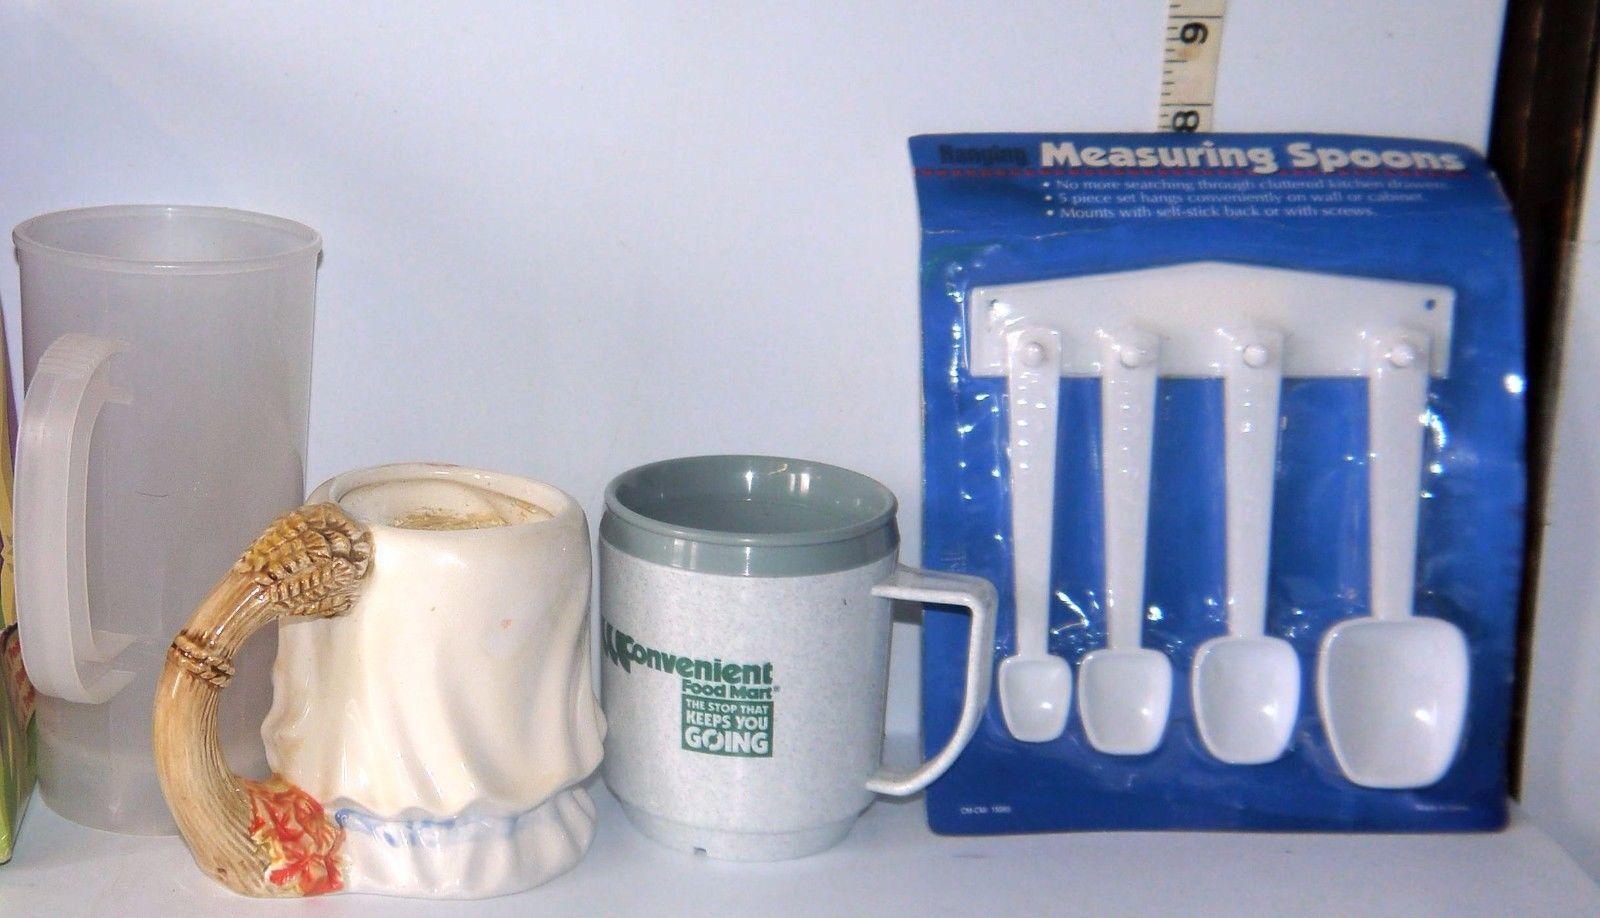 Mixed Lot 5 Items Measuring Spoons, Plastic Coffee Cups, Pilgrim Girl Candle Mug